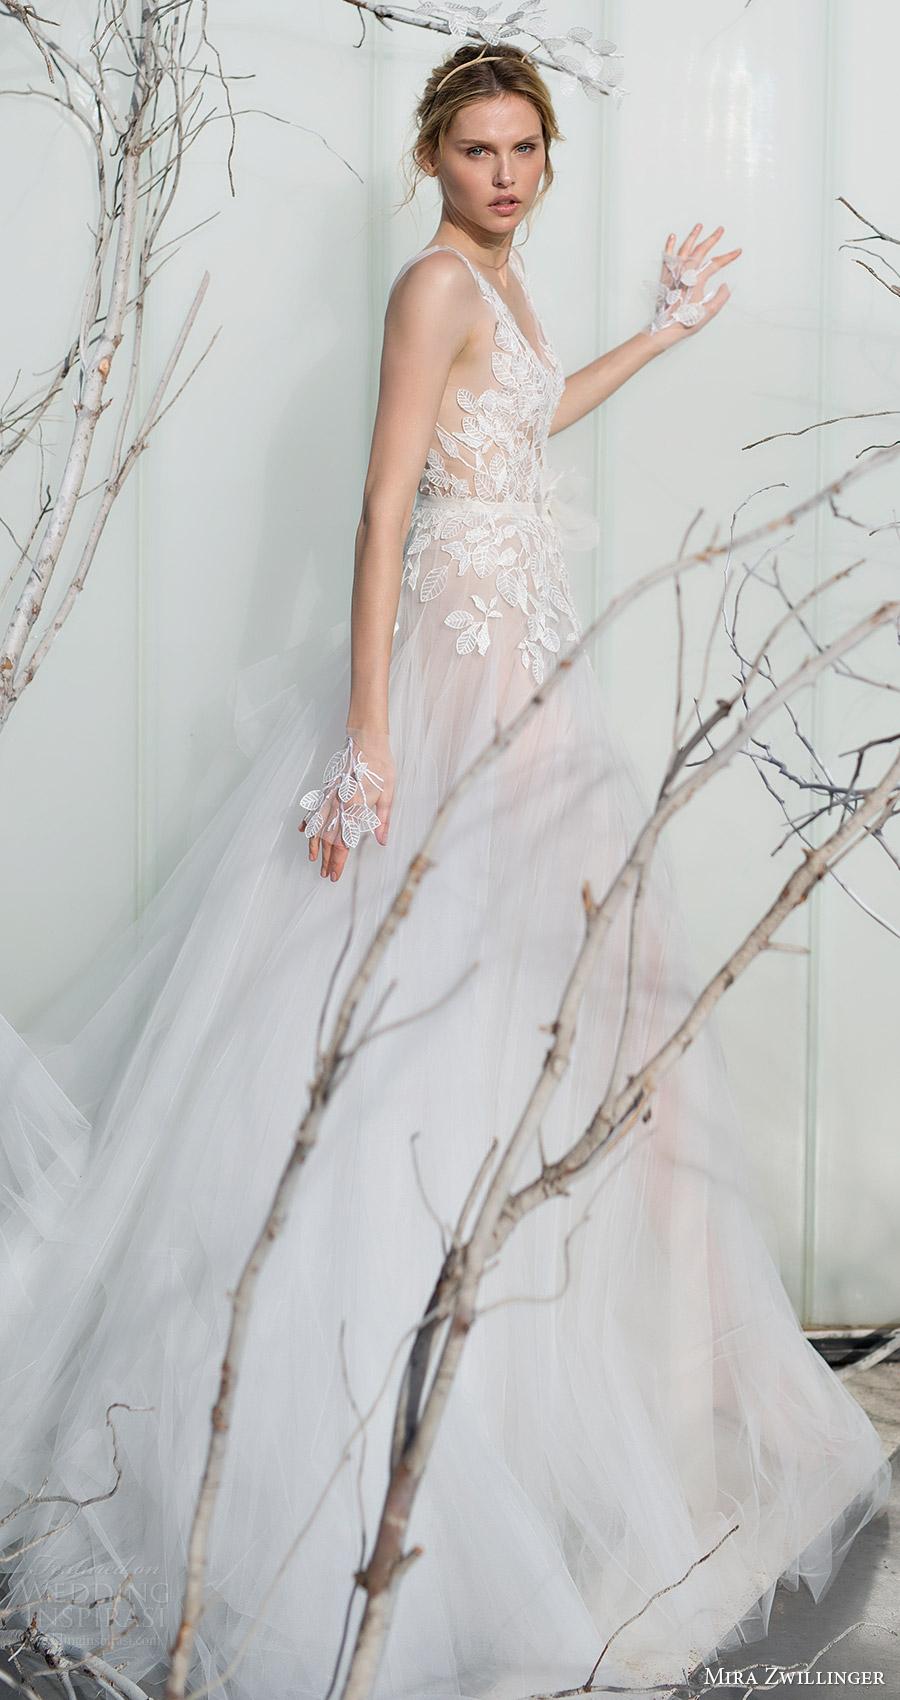 mira zwillinger bridal 2017 sleeveless illusion straps vneck aline wedding dress (fern) sv